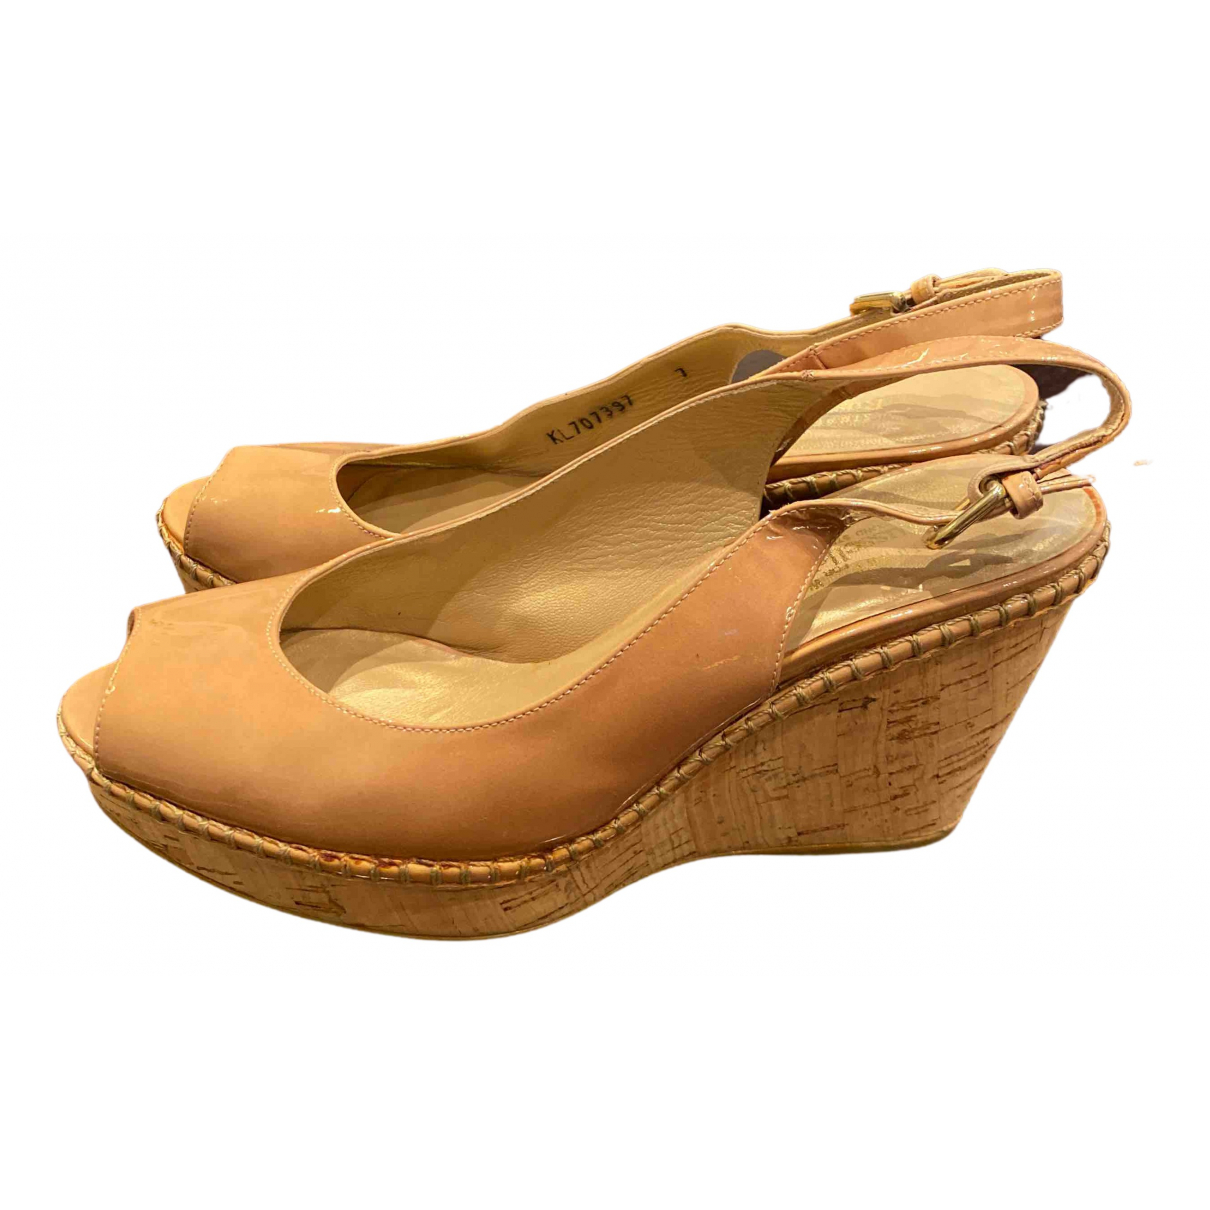 Stuart Weitzman N Beige Patent leather Sandals for Women 7 UK